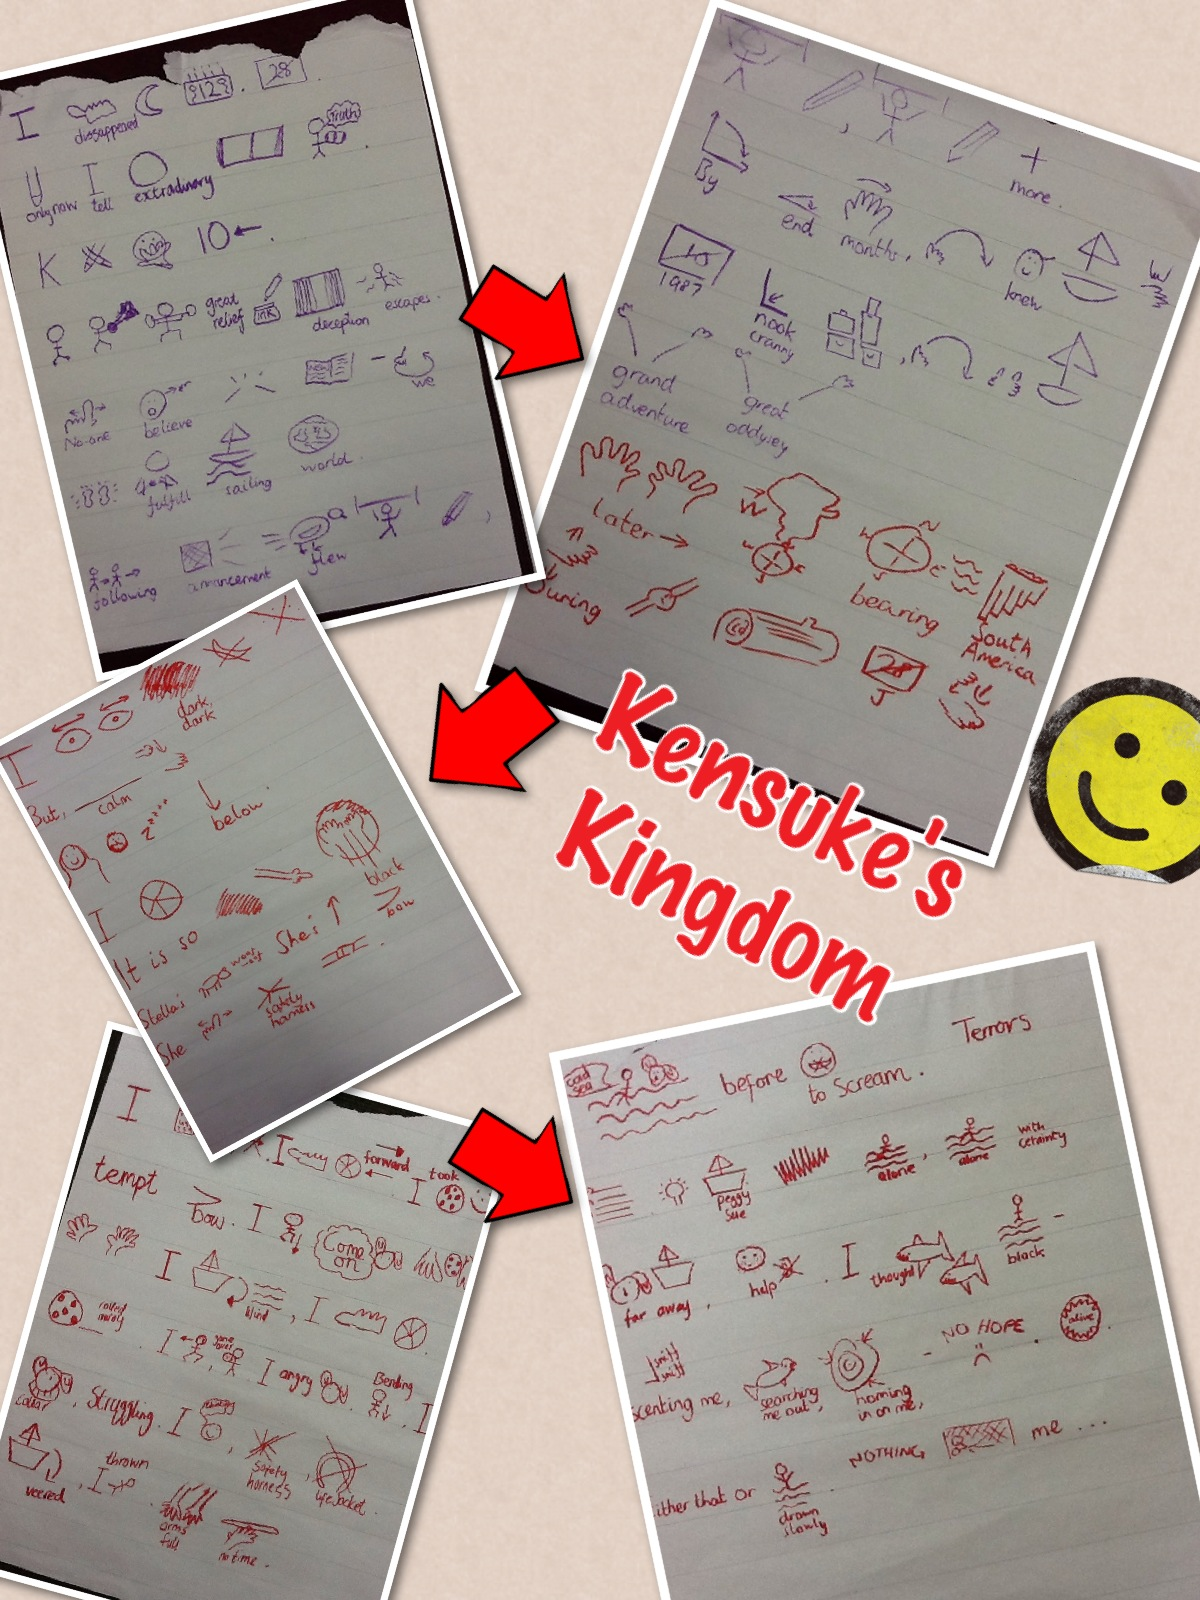 Kensuke S Kingdom Story Mapping 6l S Blog